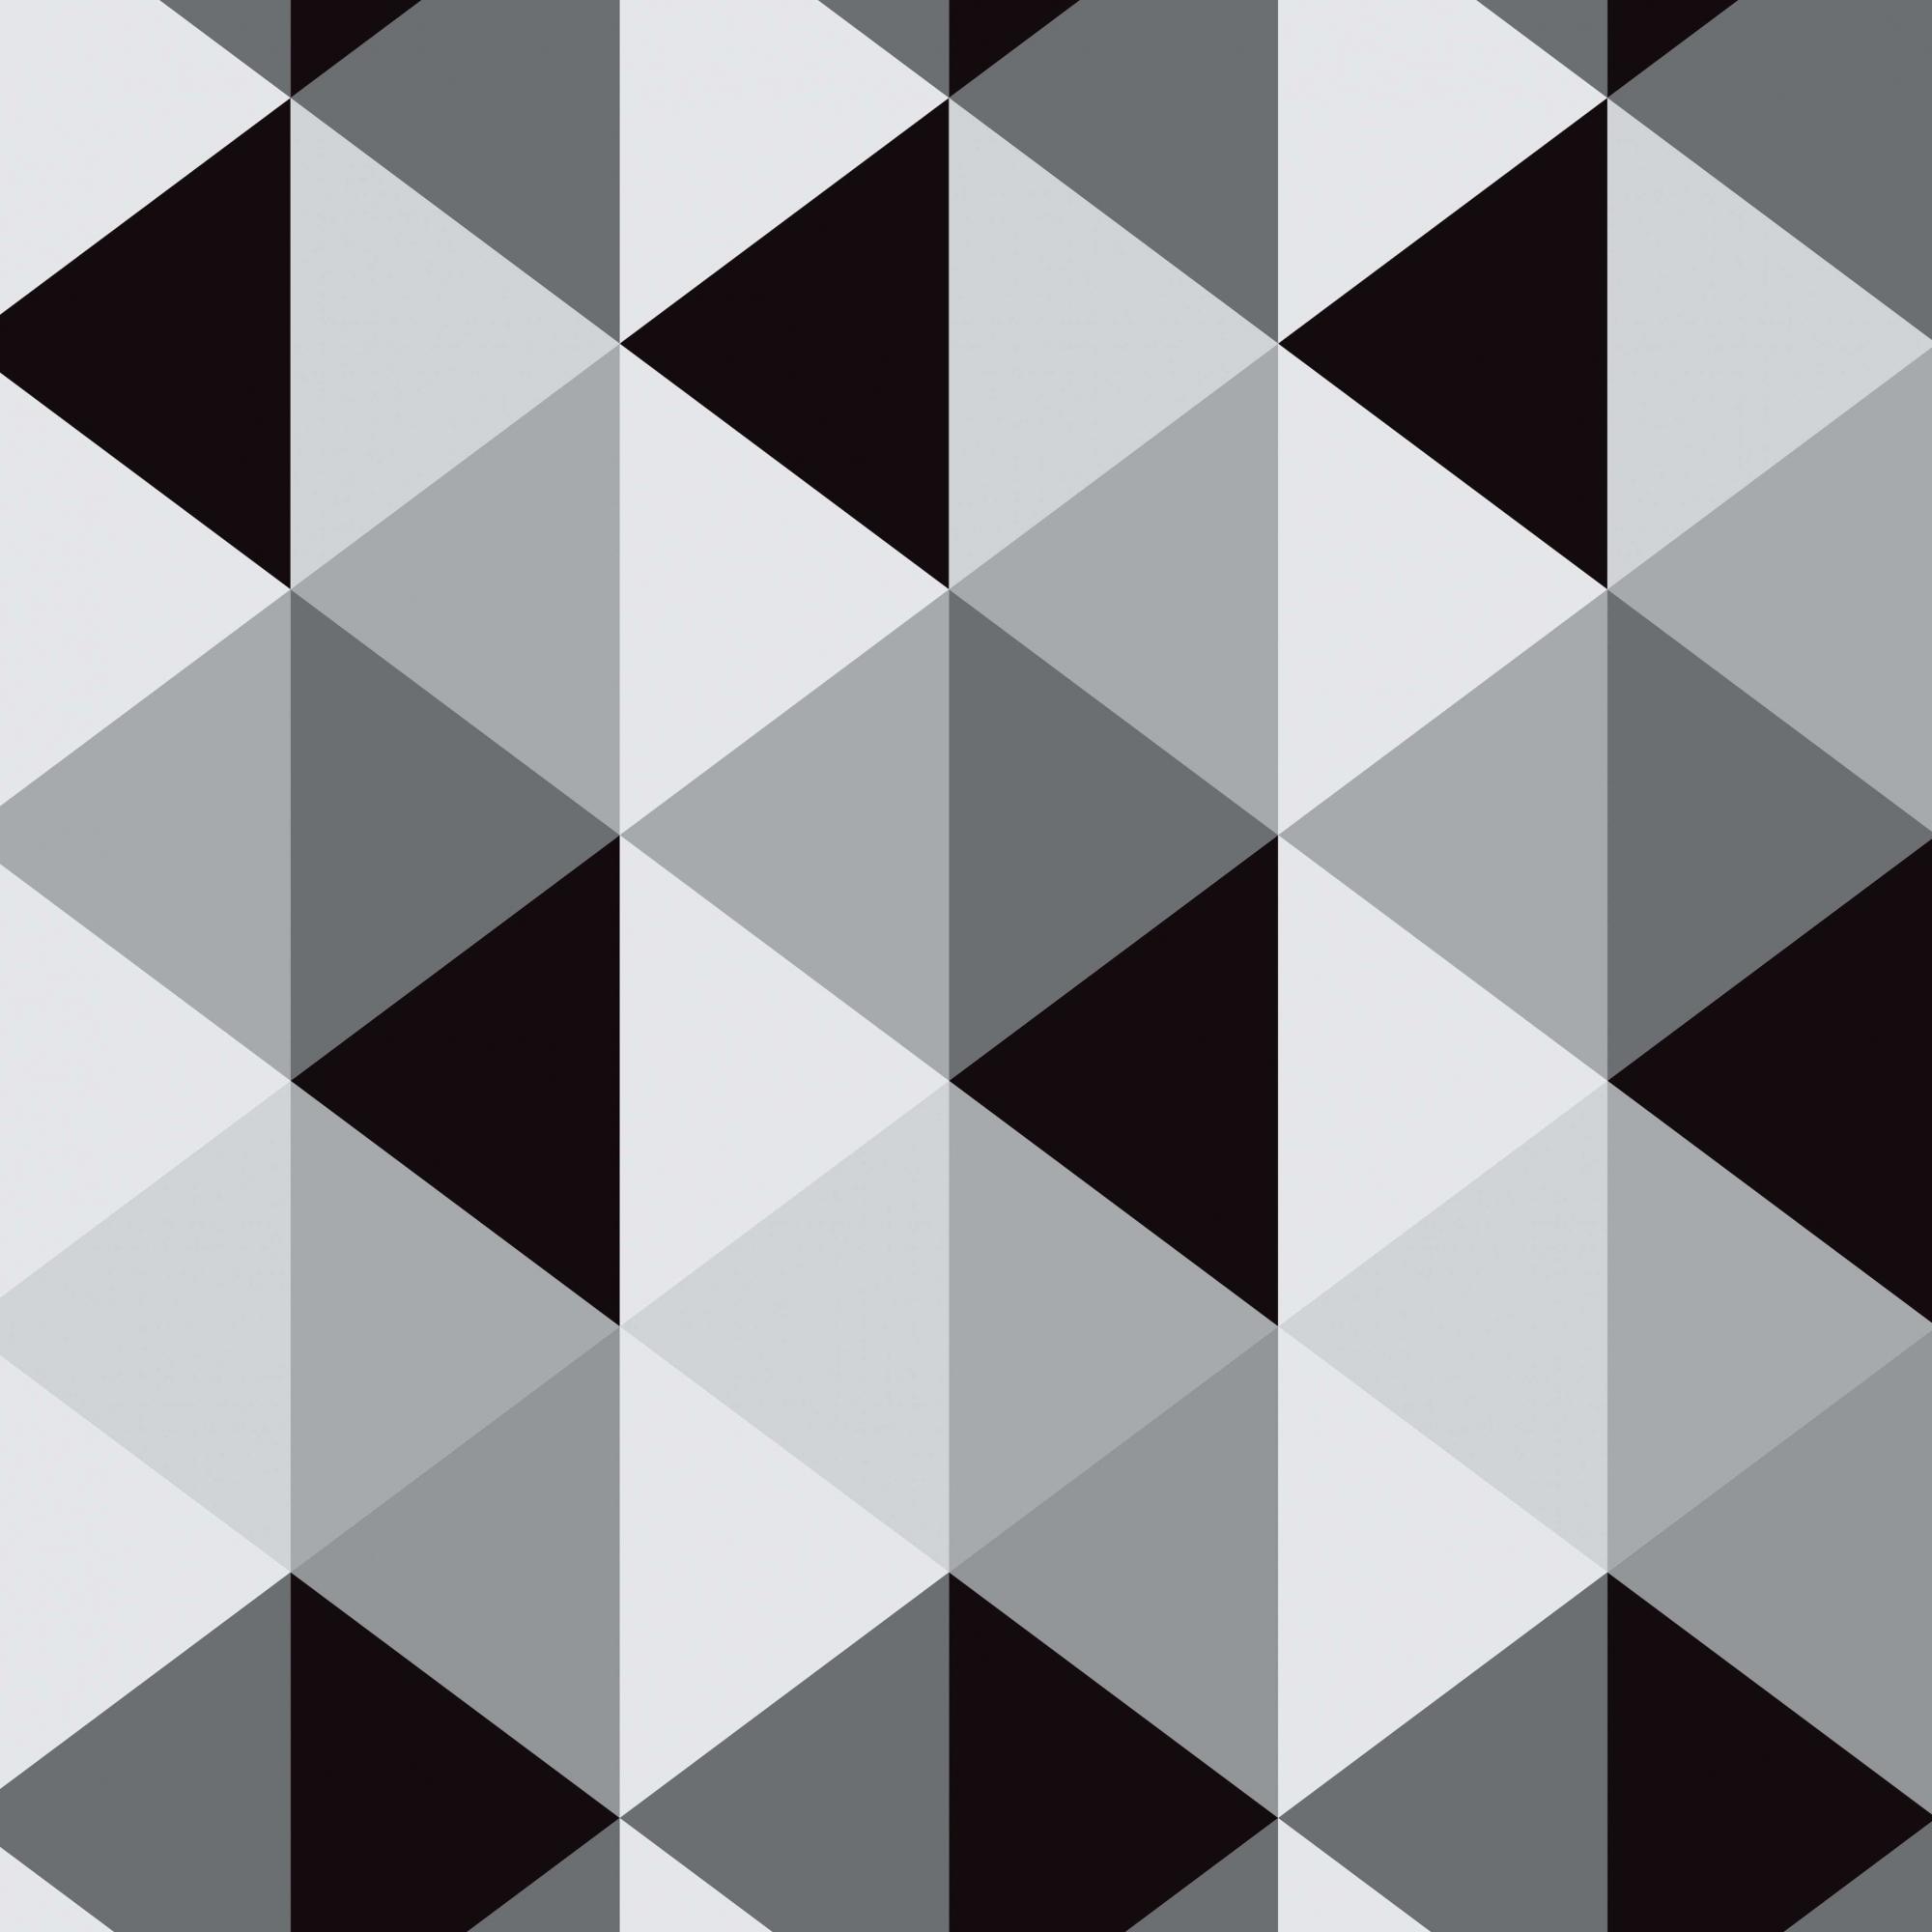 Papel de Parede Geométrico Cinza e Preto